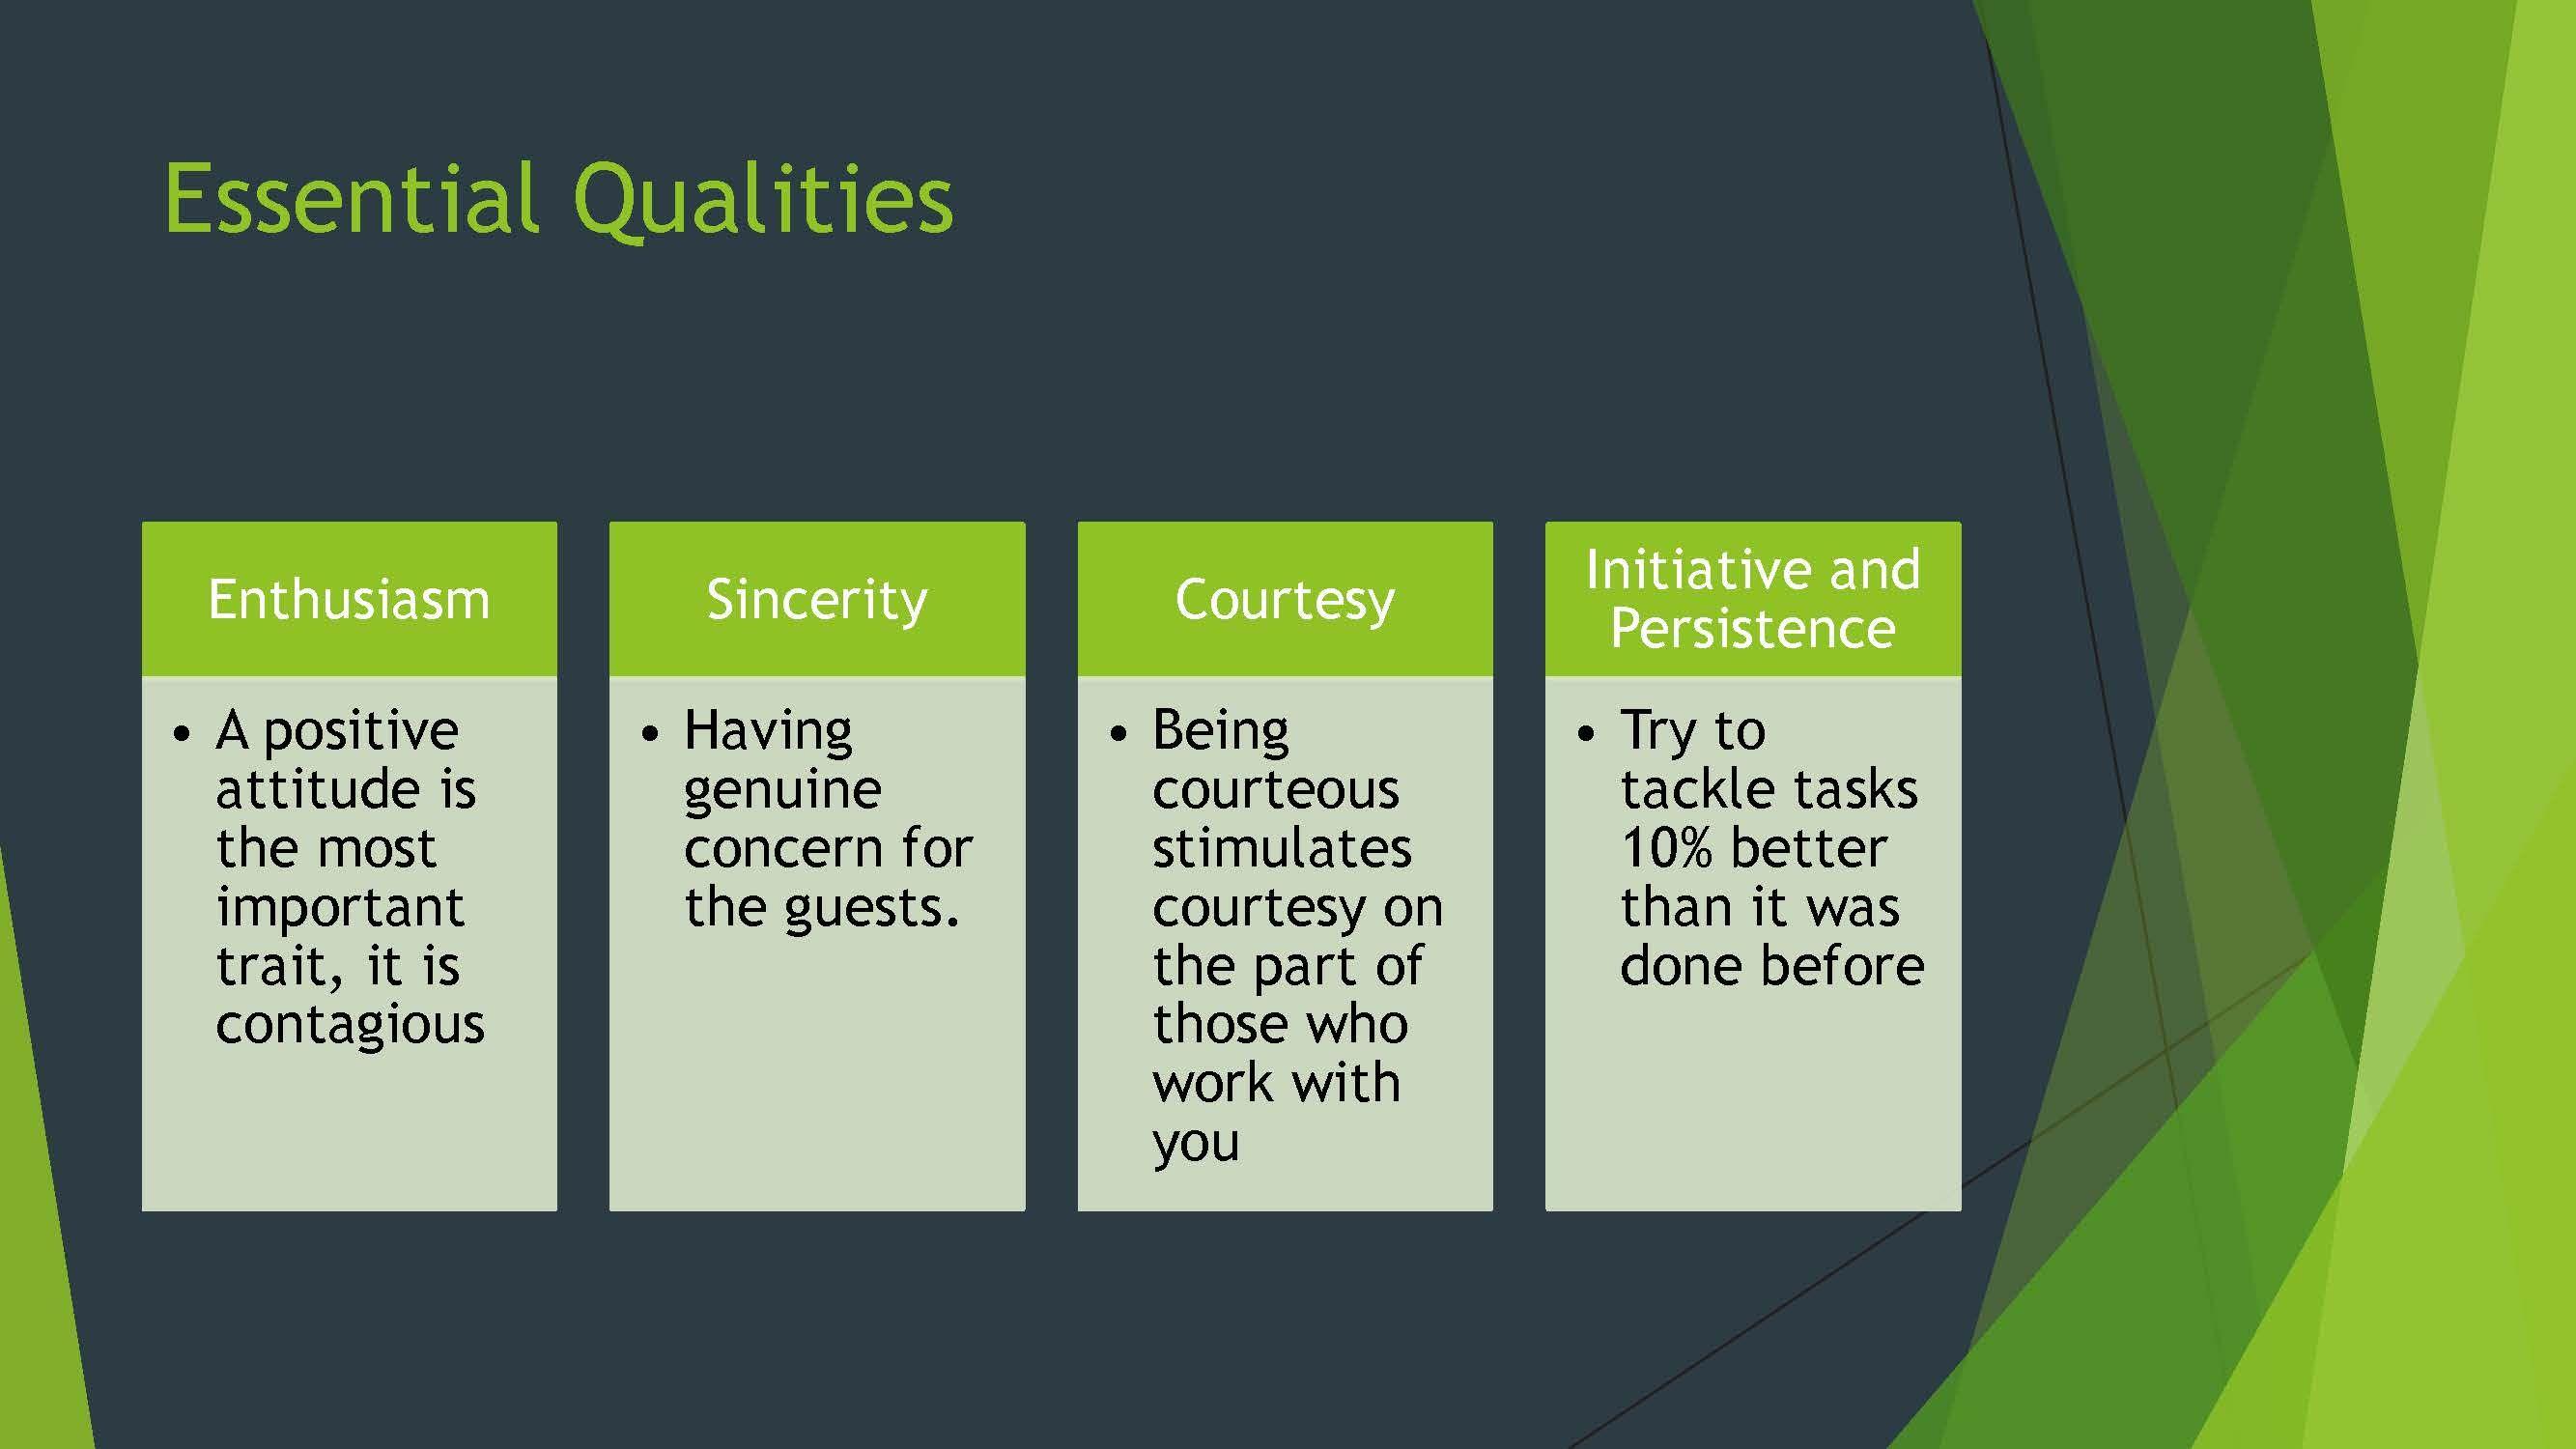 Restaurant server's essential qualities presentation